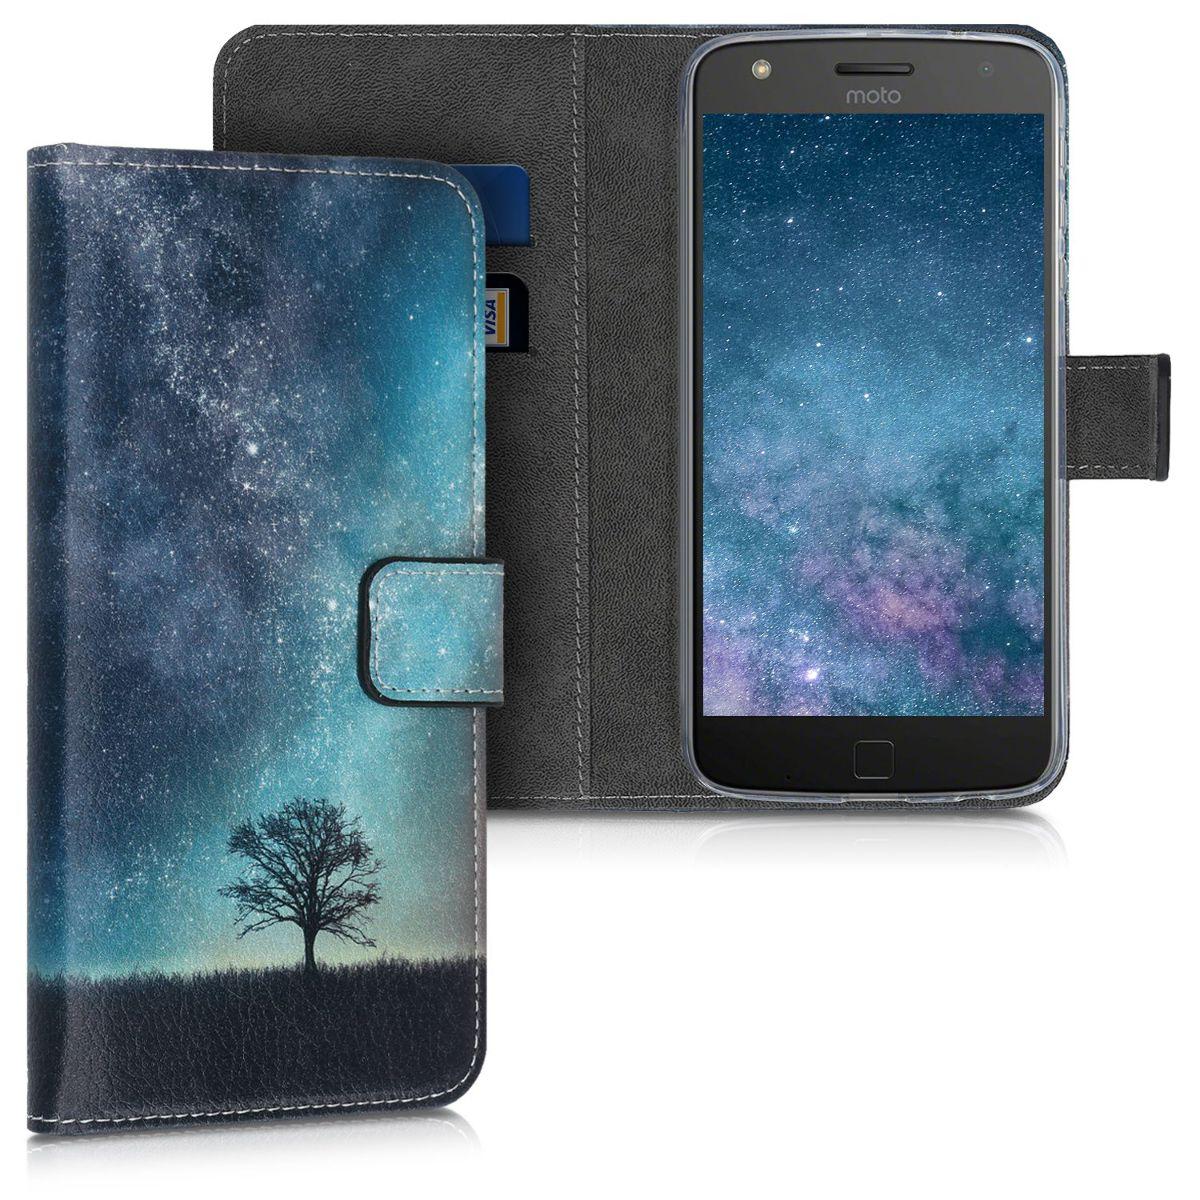 Kožené pouzdro | obal pro Motorola Moto Z Play - Cosmic Nature Modrá / Šedá / Černá